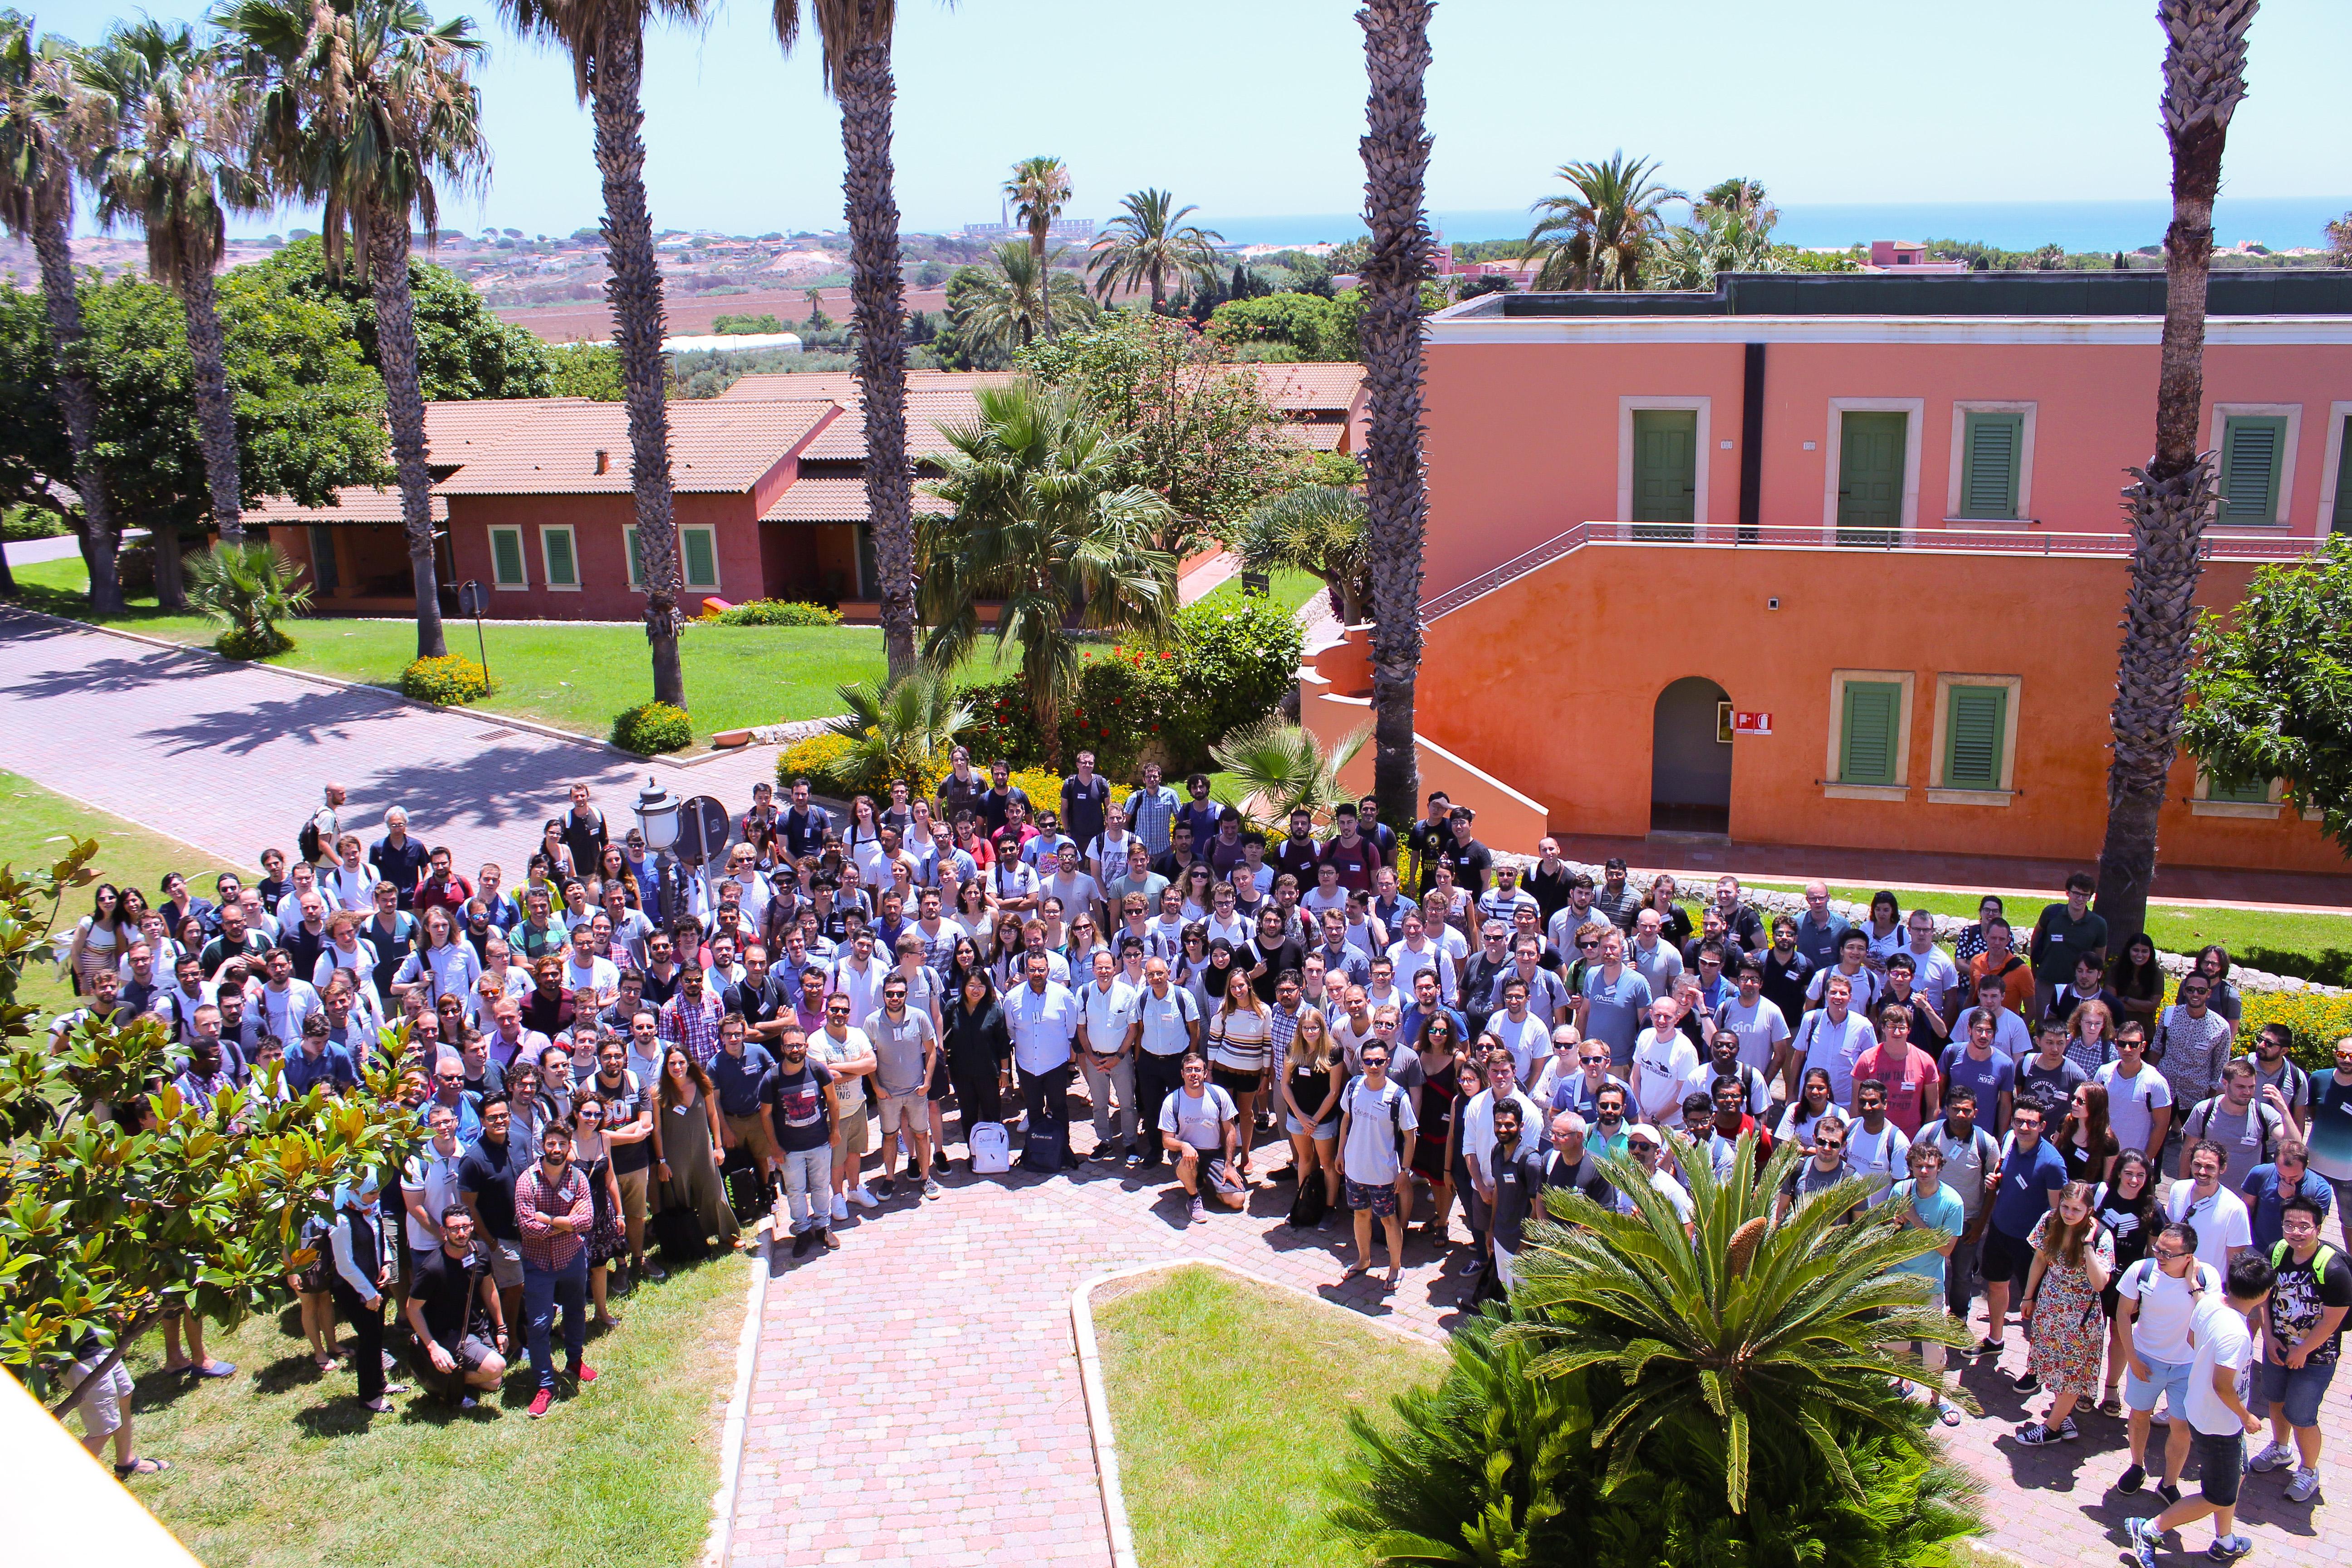 ICVSS 2018 - International Computer Vision Summer School 2018